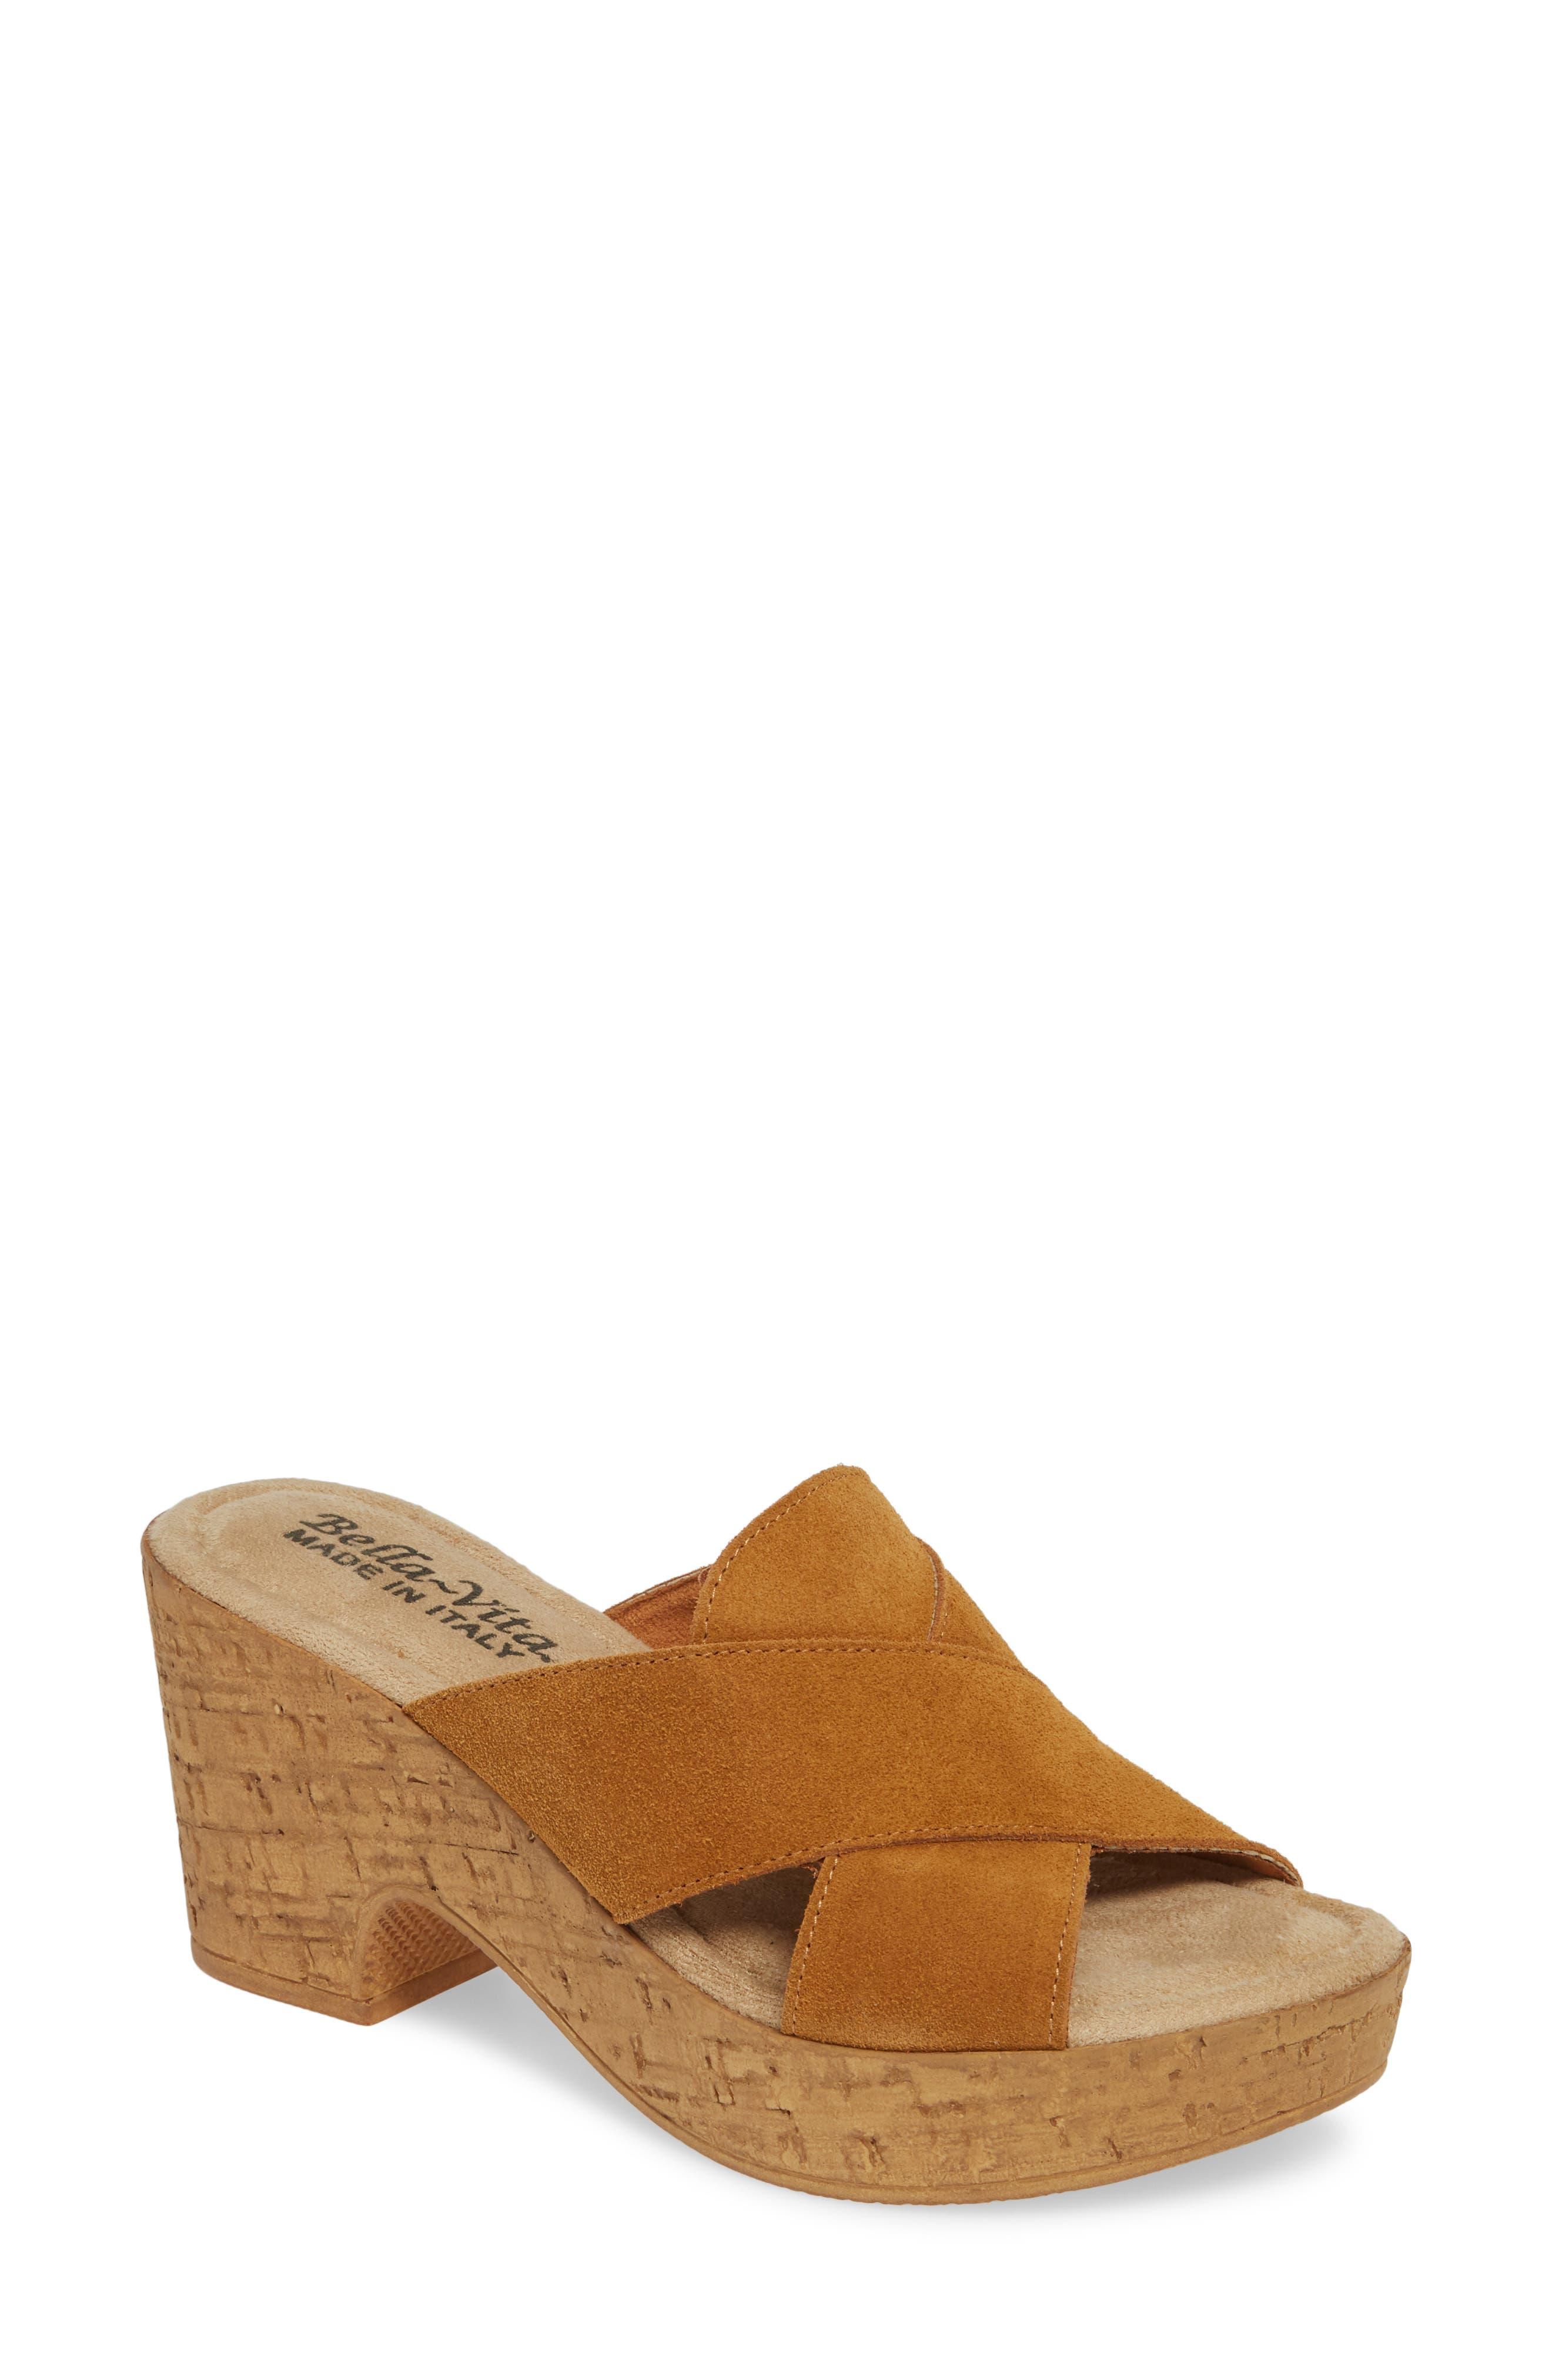 Bella Vita Platform Sandal, Brown